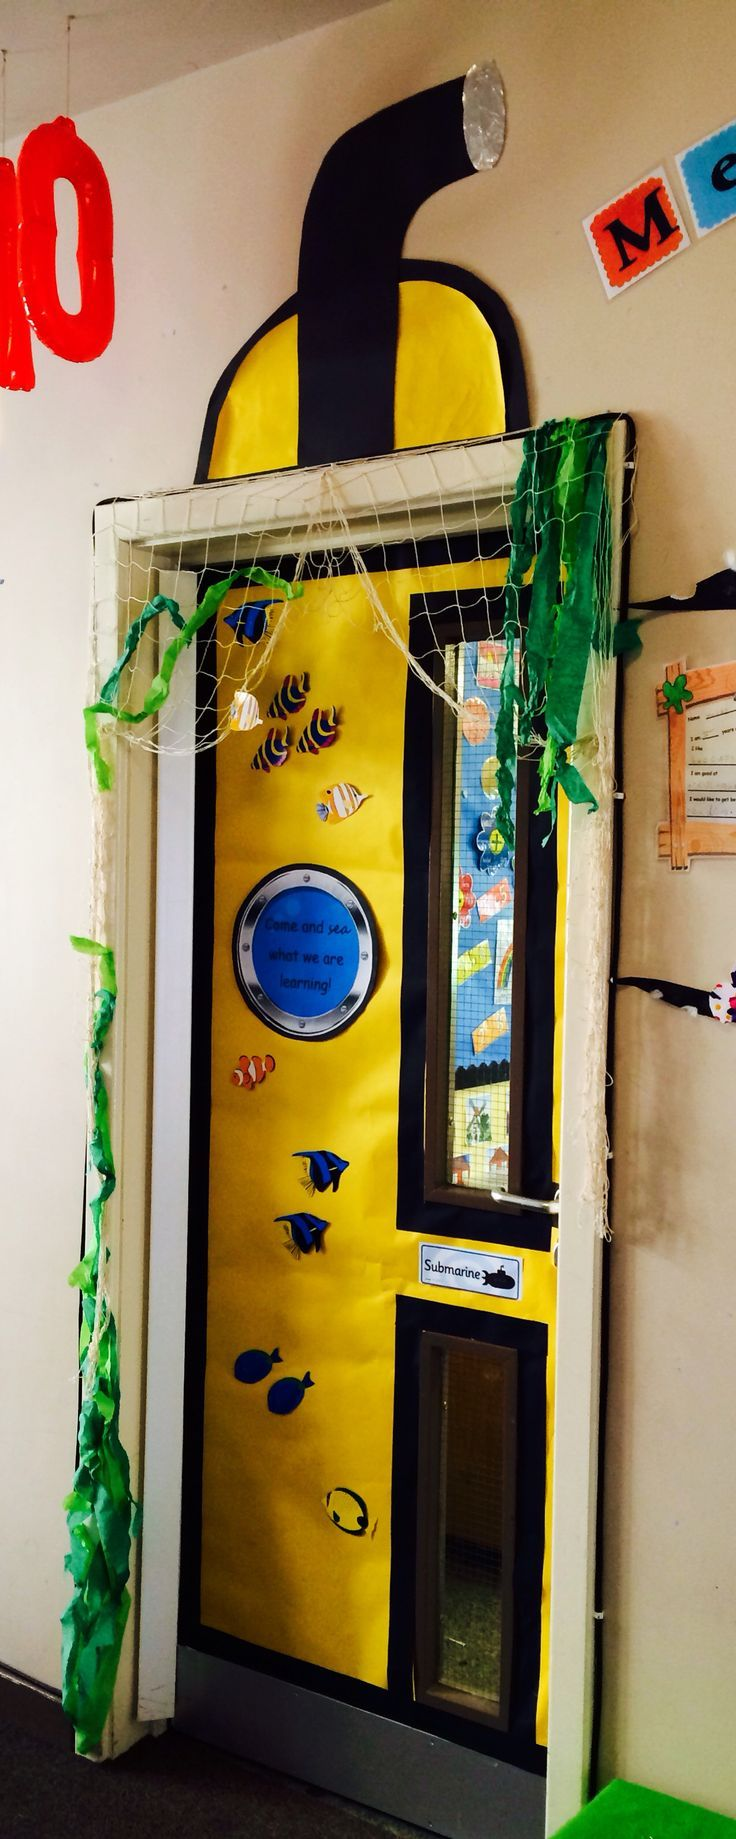 Classroom door with window - 0d738182a9fba60df8664b0d7f331c1b Jpg 736 1839 Submerged Vbsroom Doorsclassroom